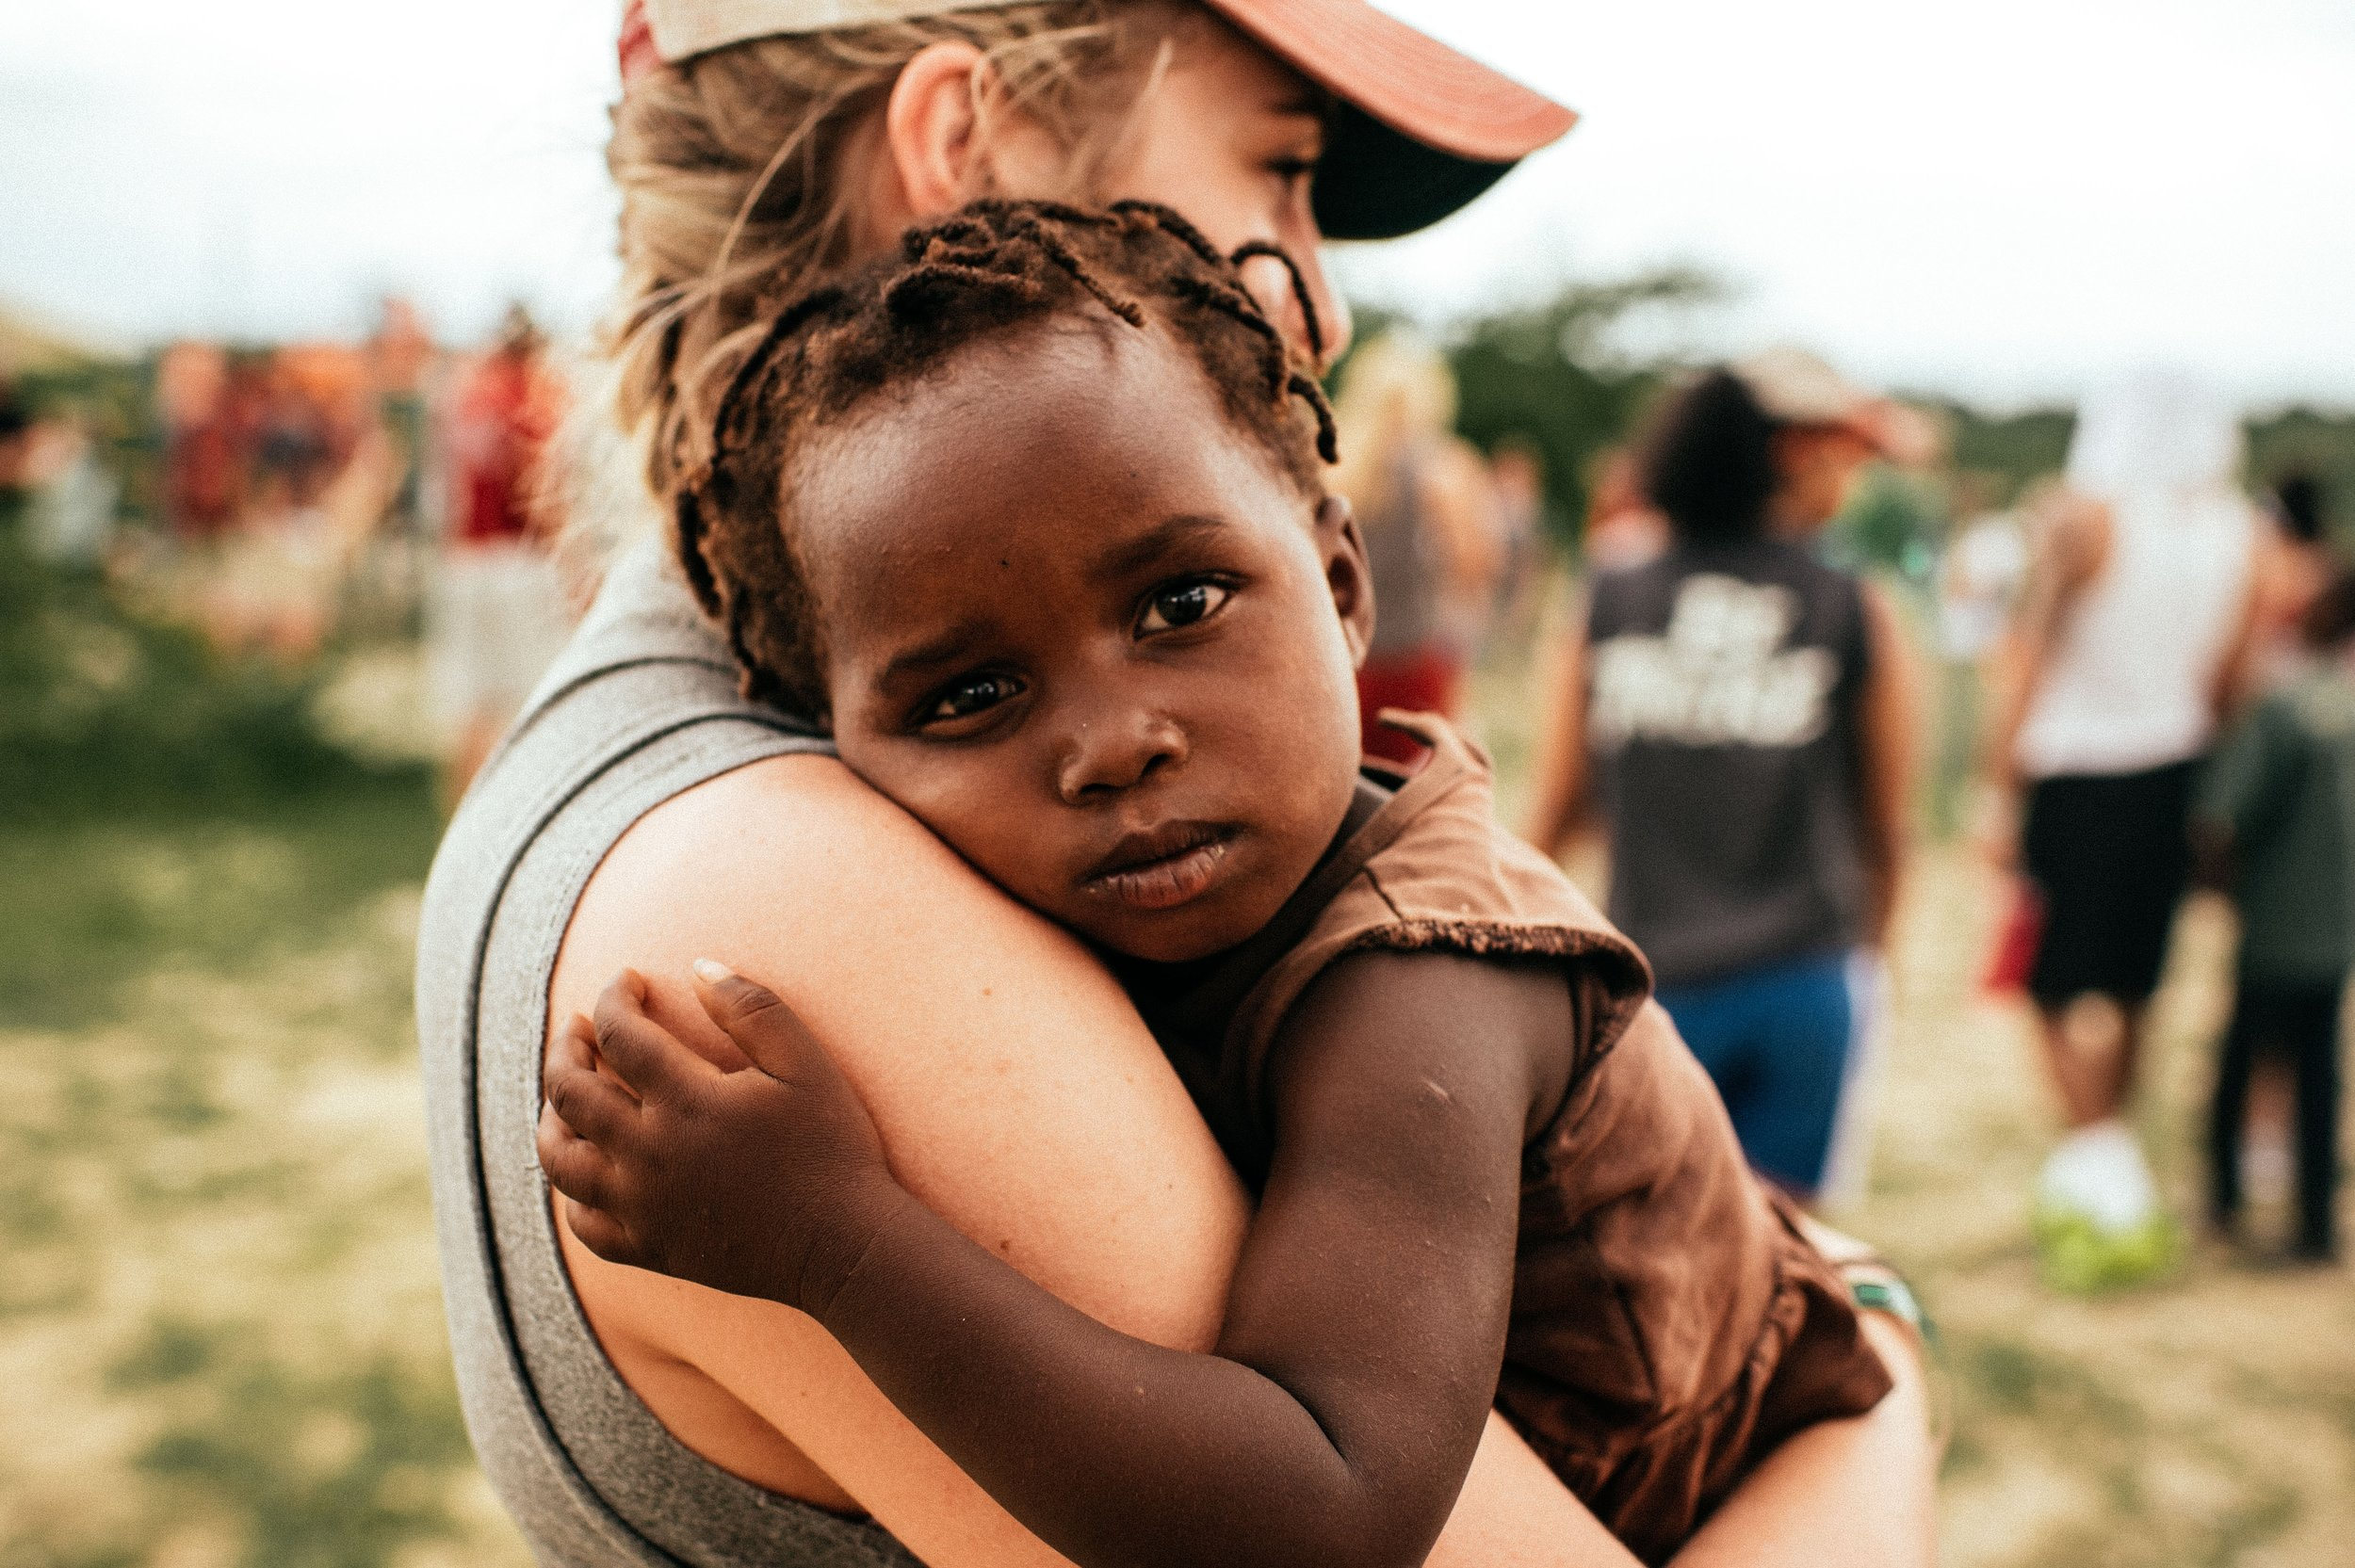 Woman Comforting Child